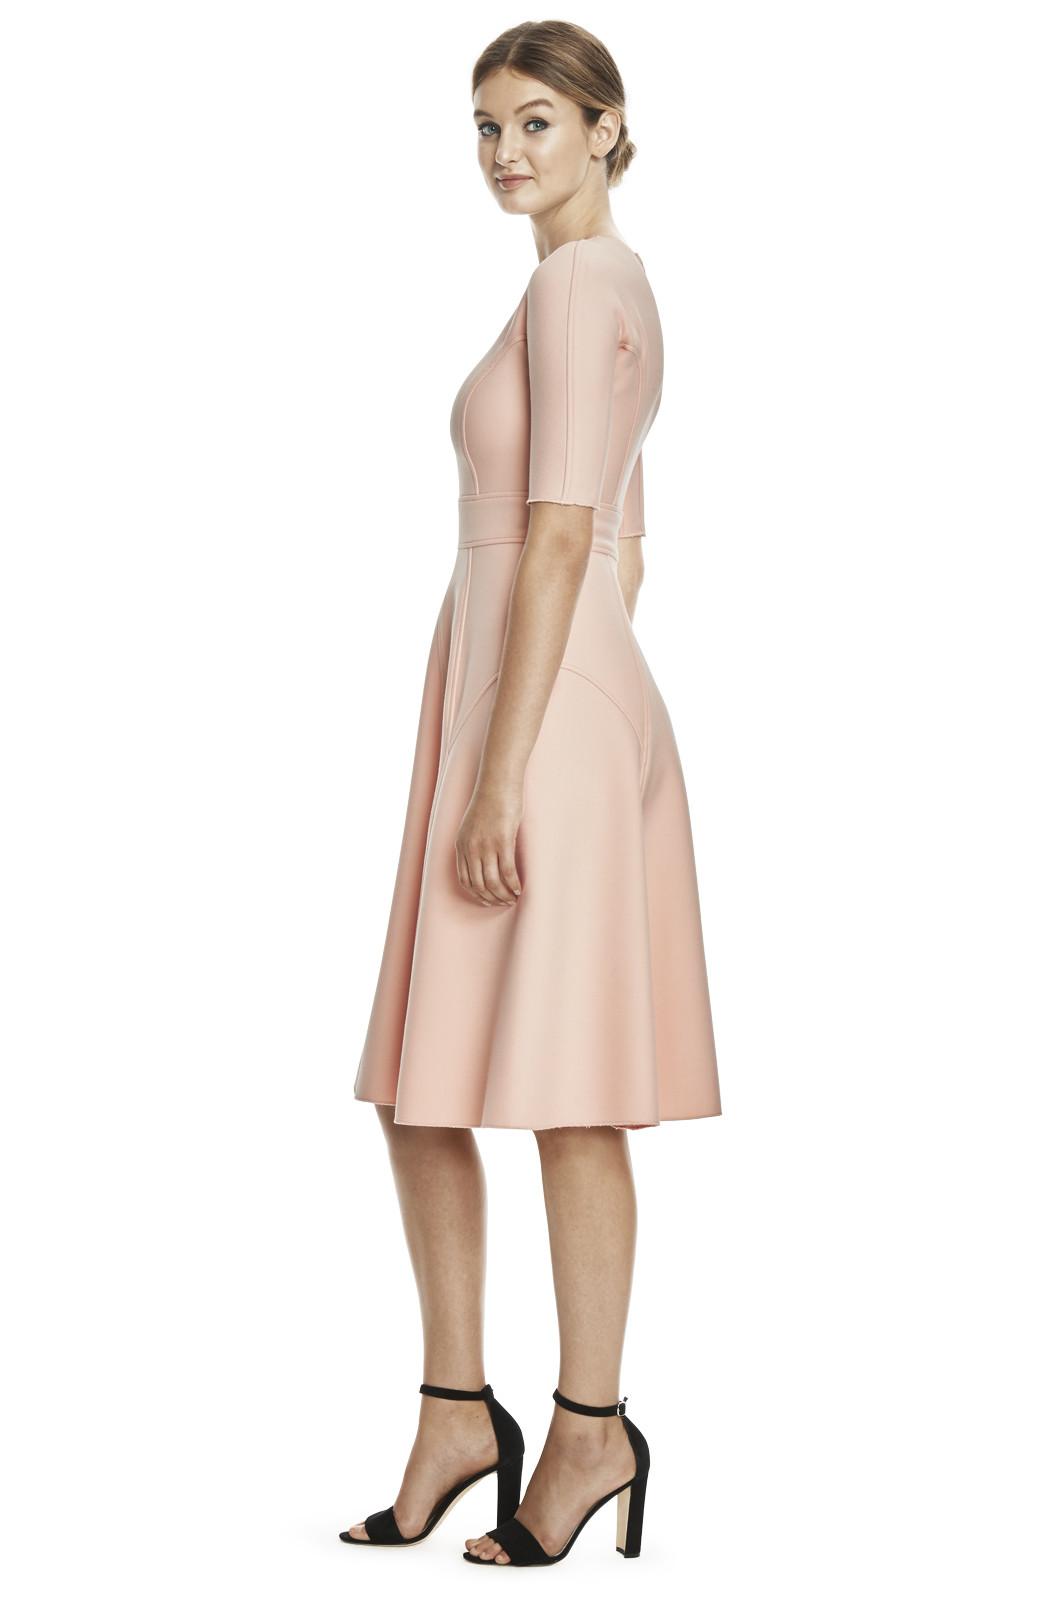 Lela Rose Dress from the Side